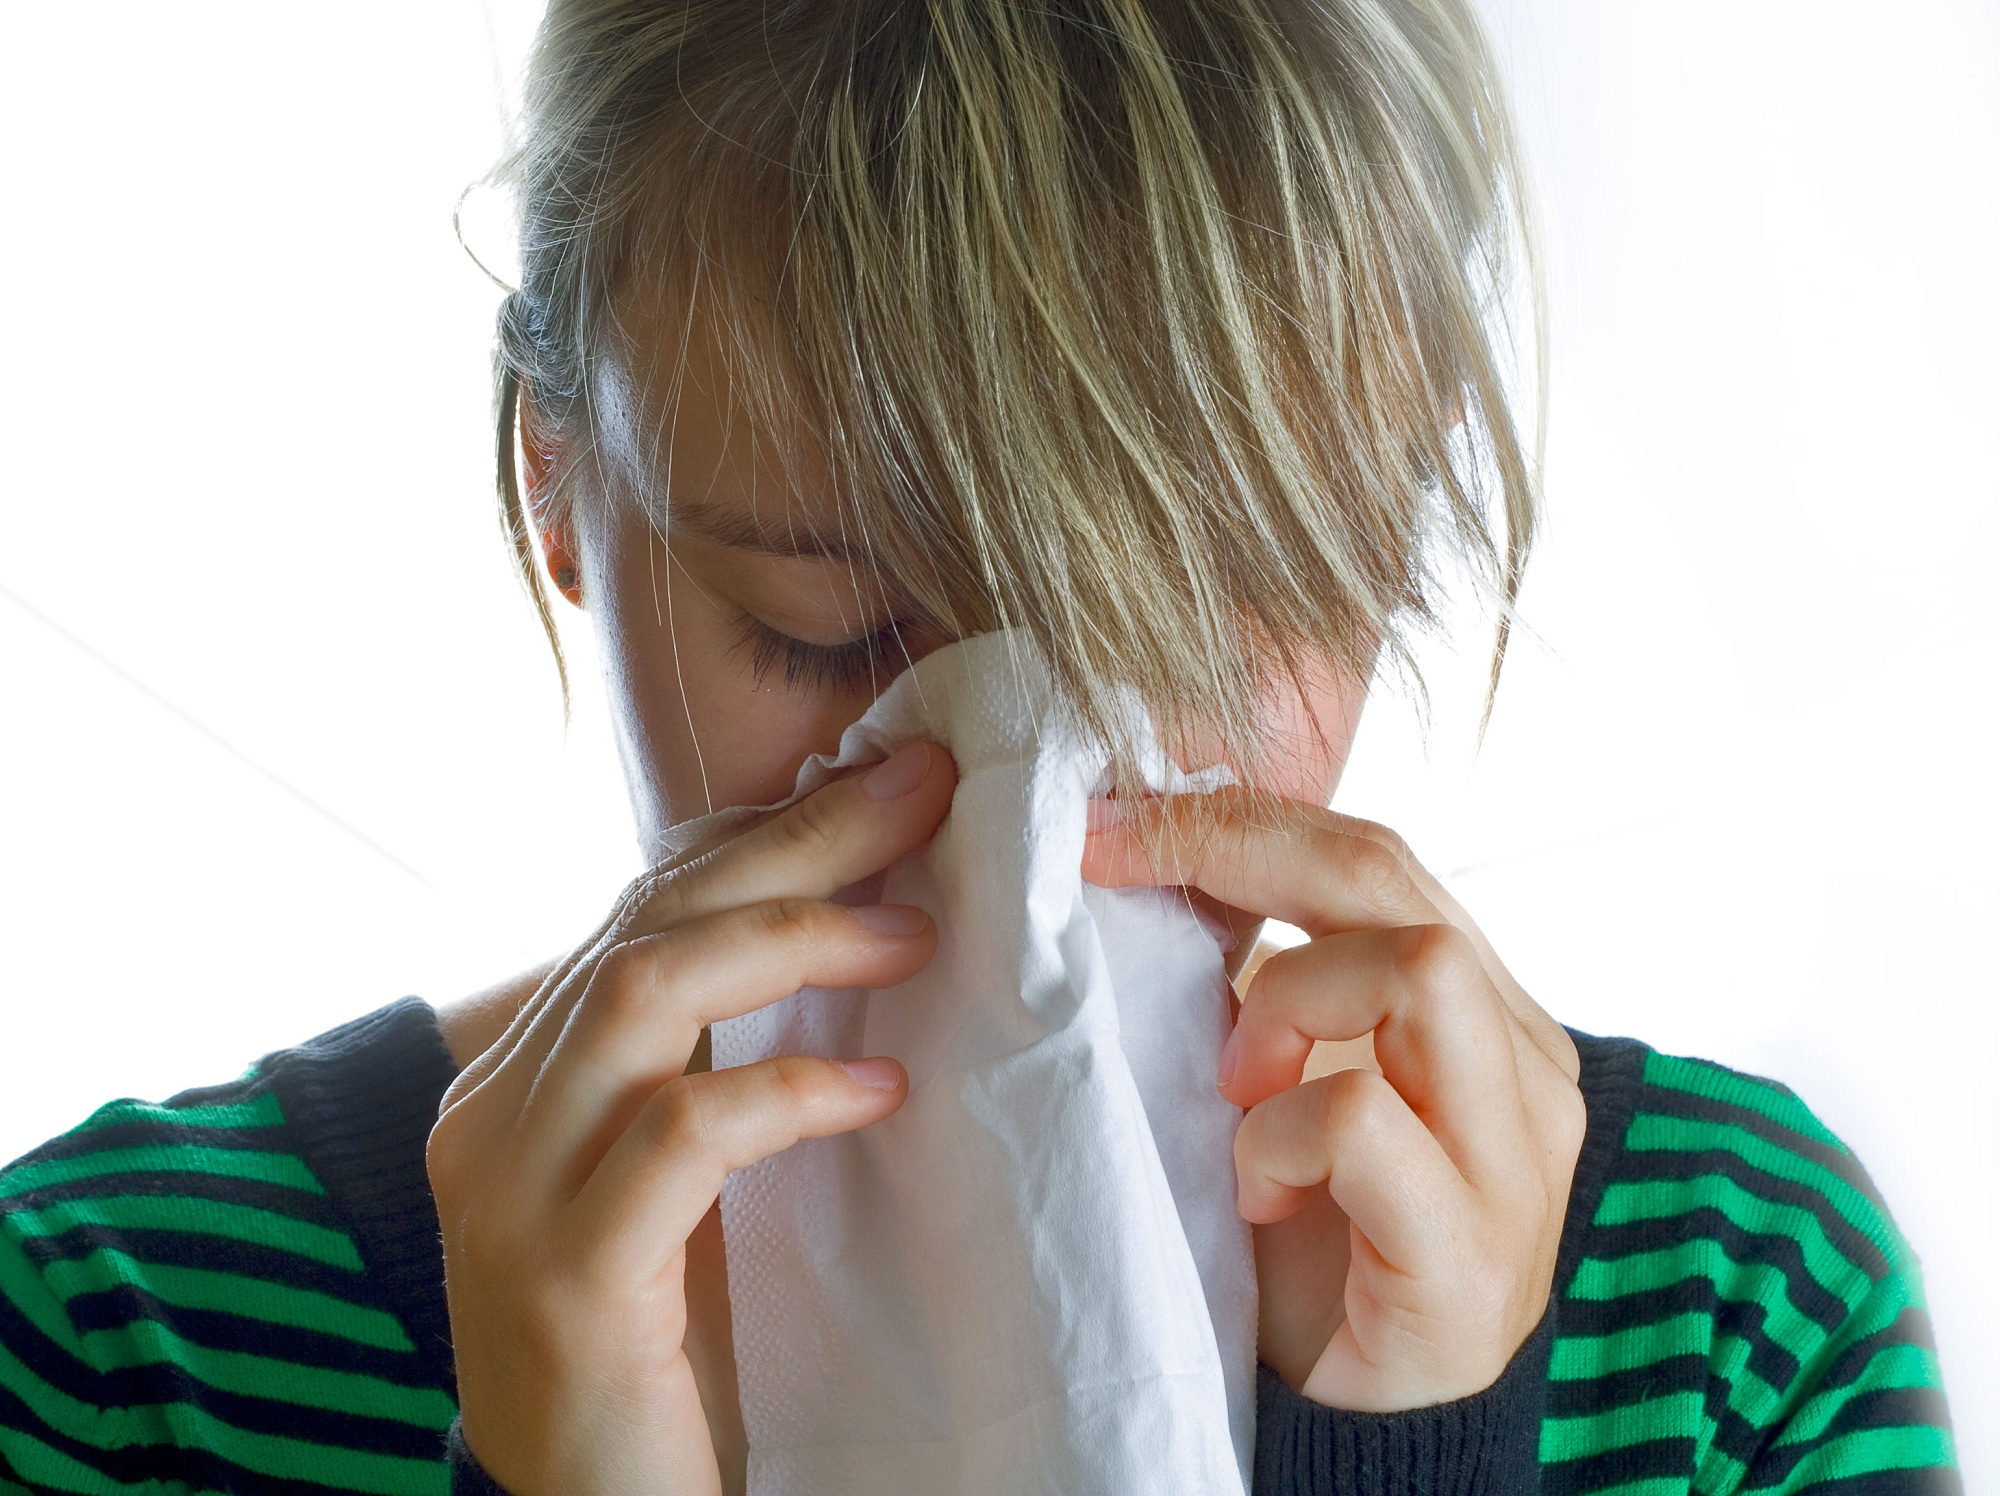 Airborne – the threat of influenza